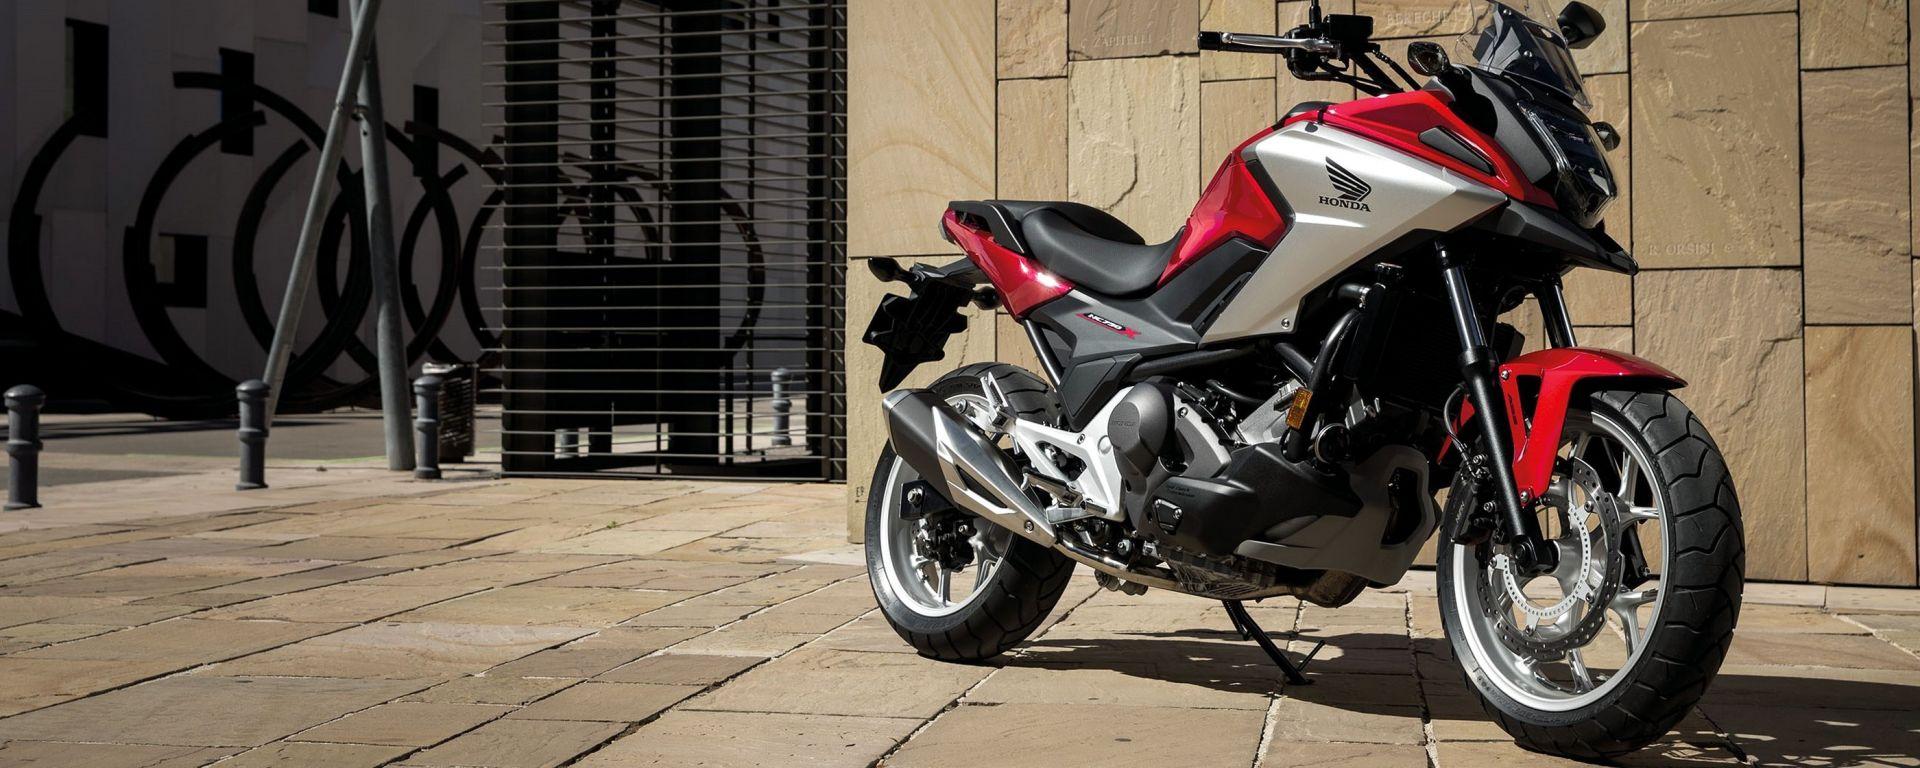 Honda NC750X 2016: in concessionaria da 7.390 euro